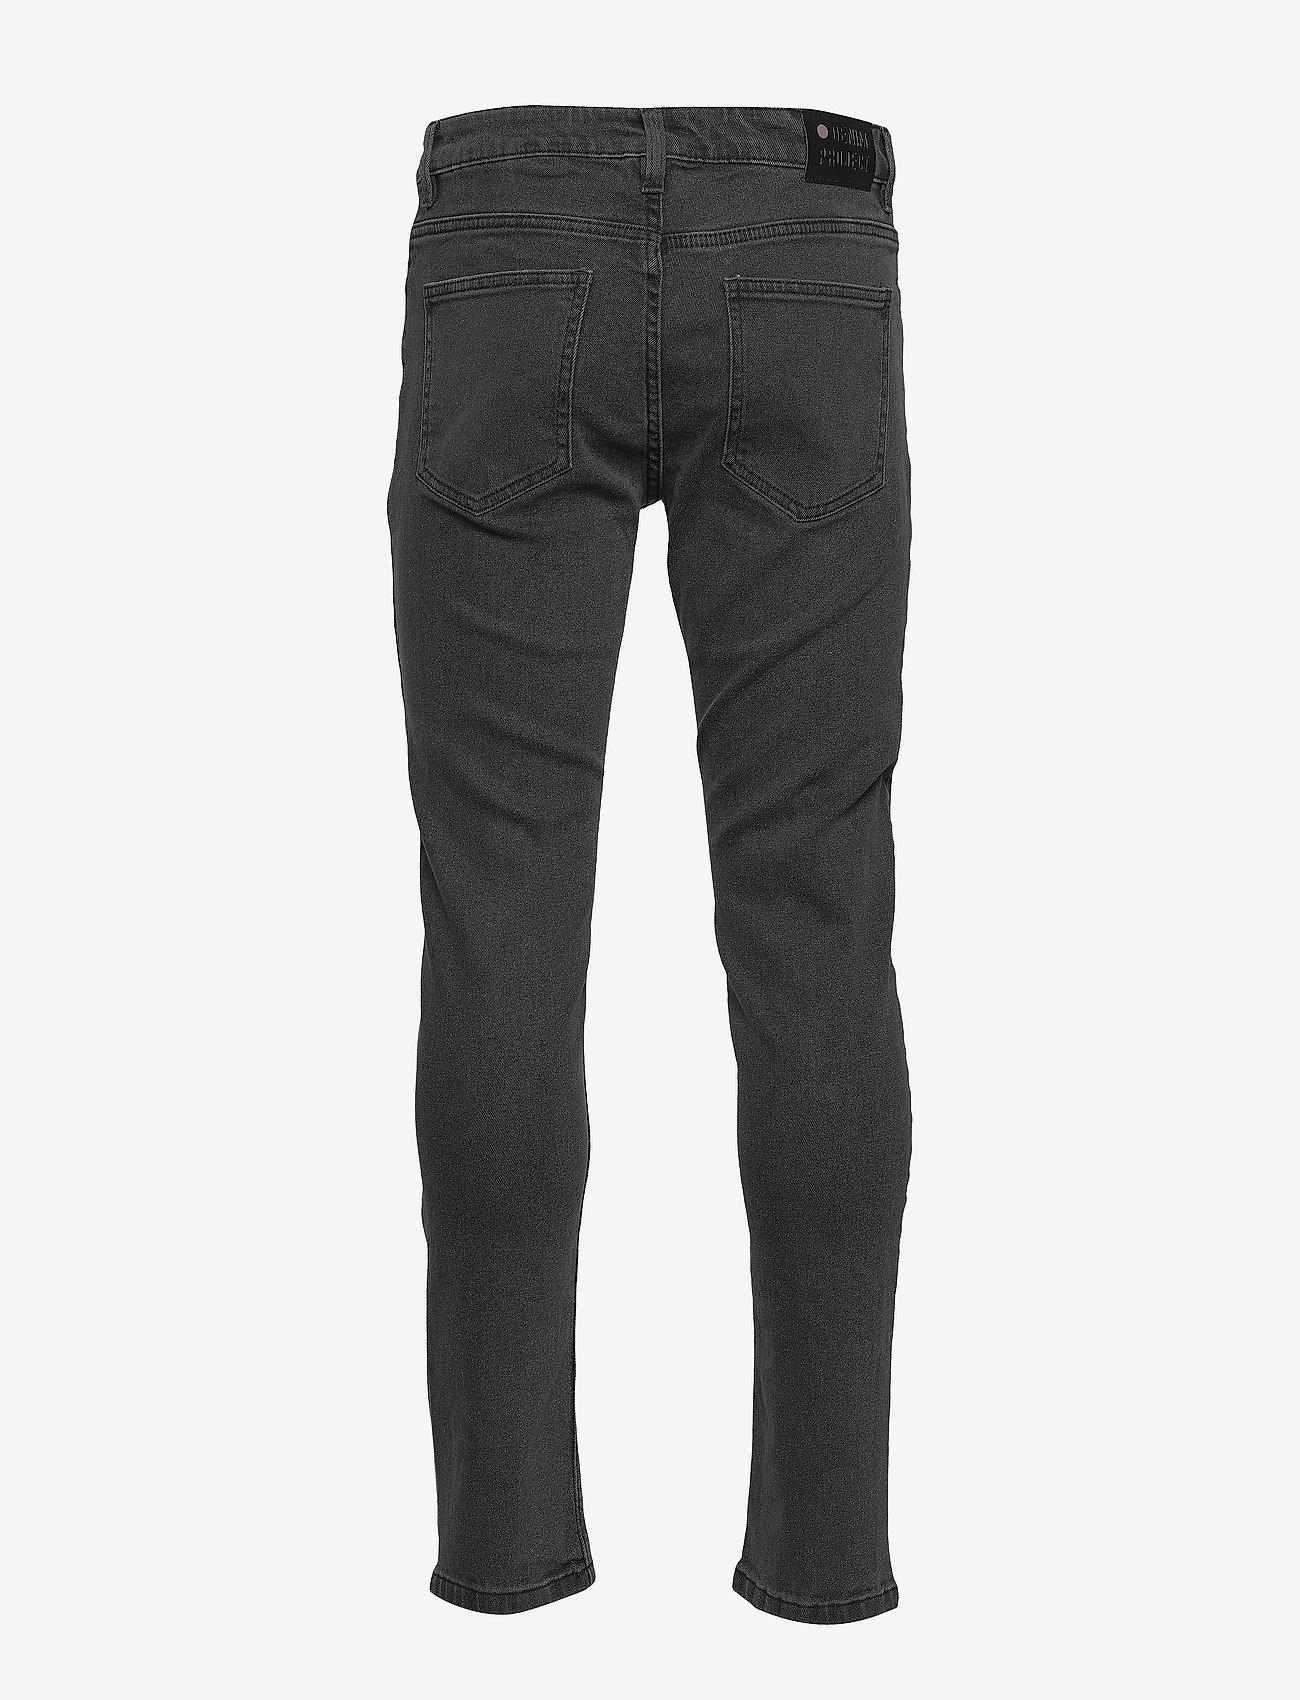 Denim project - Mr. Red - slim jeans - grey - 1